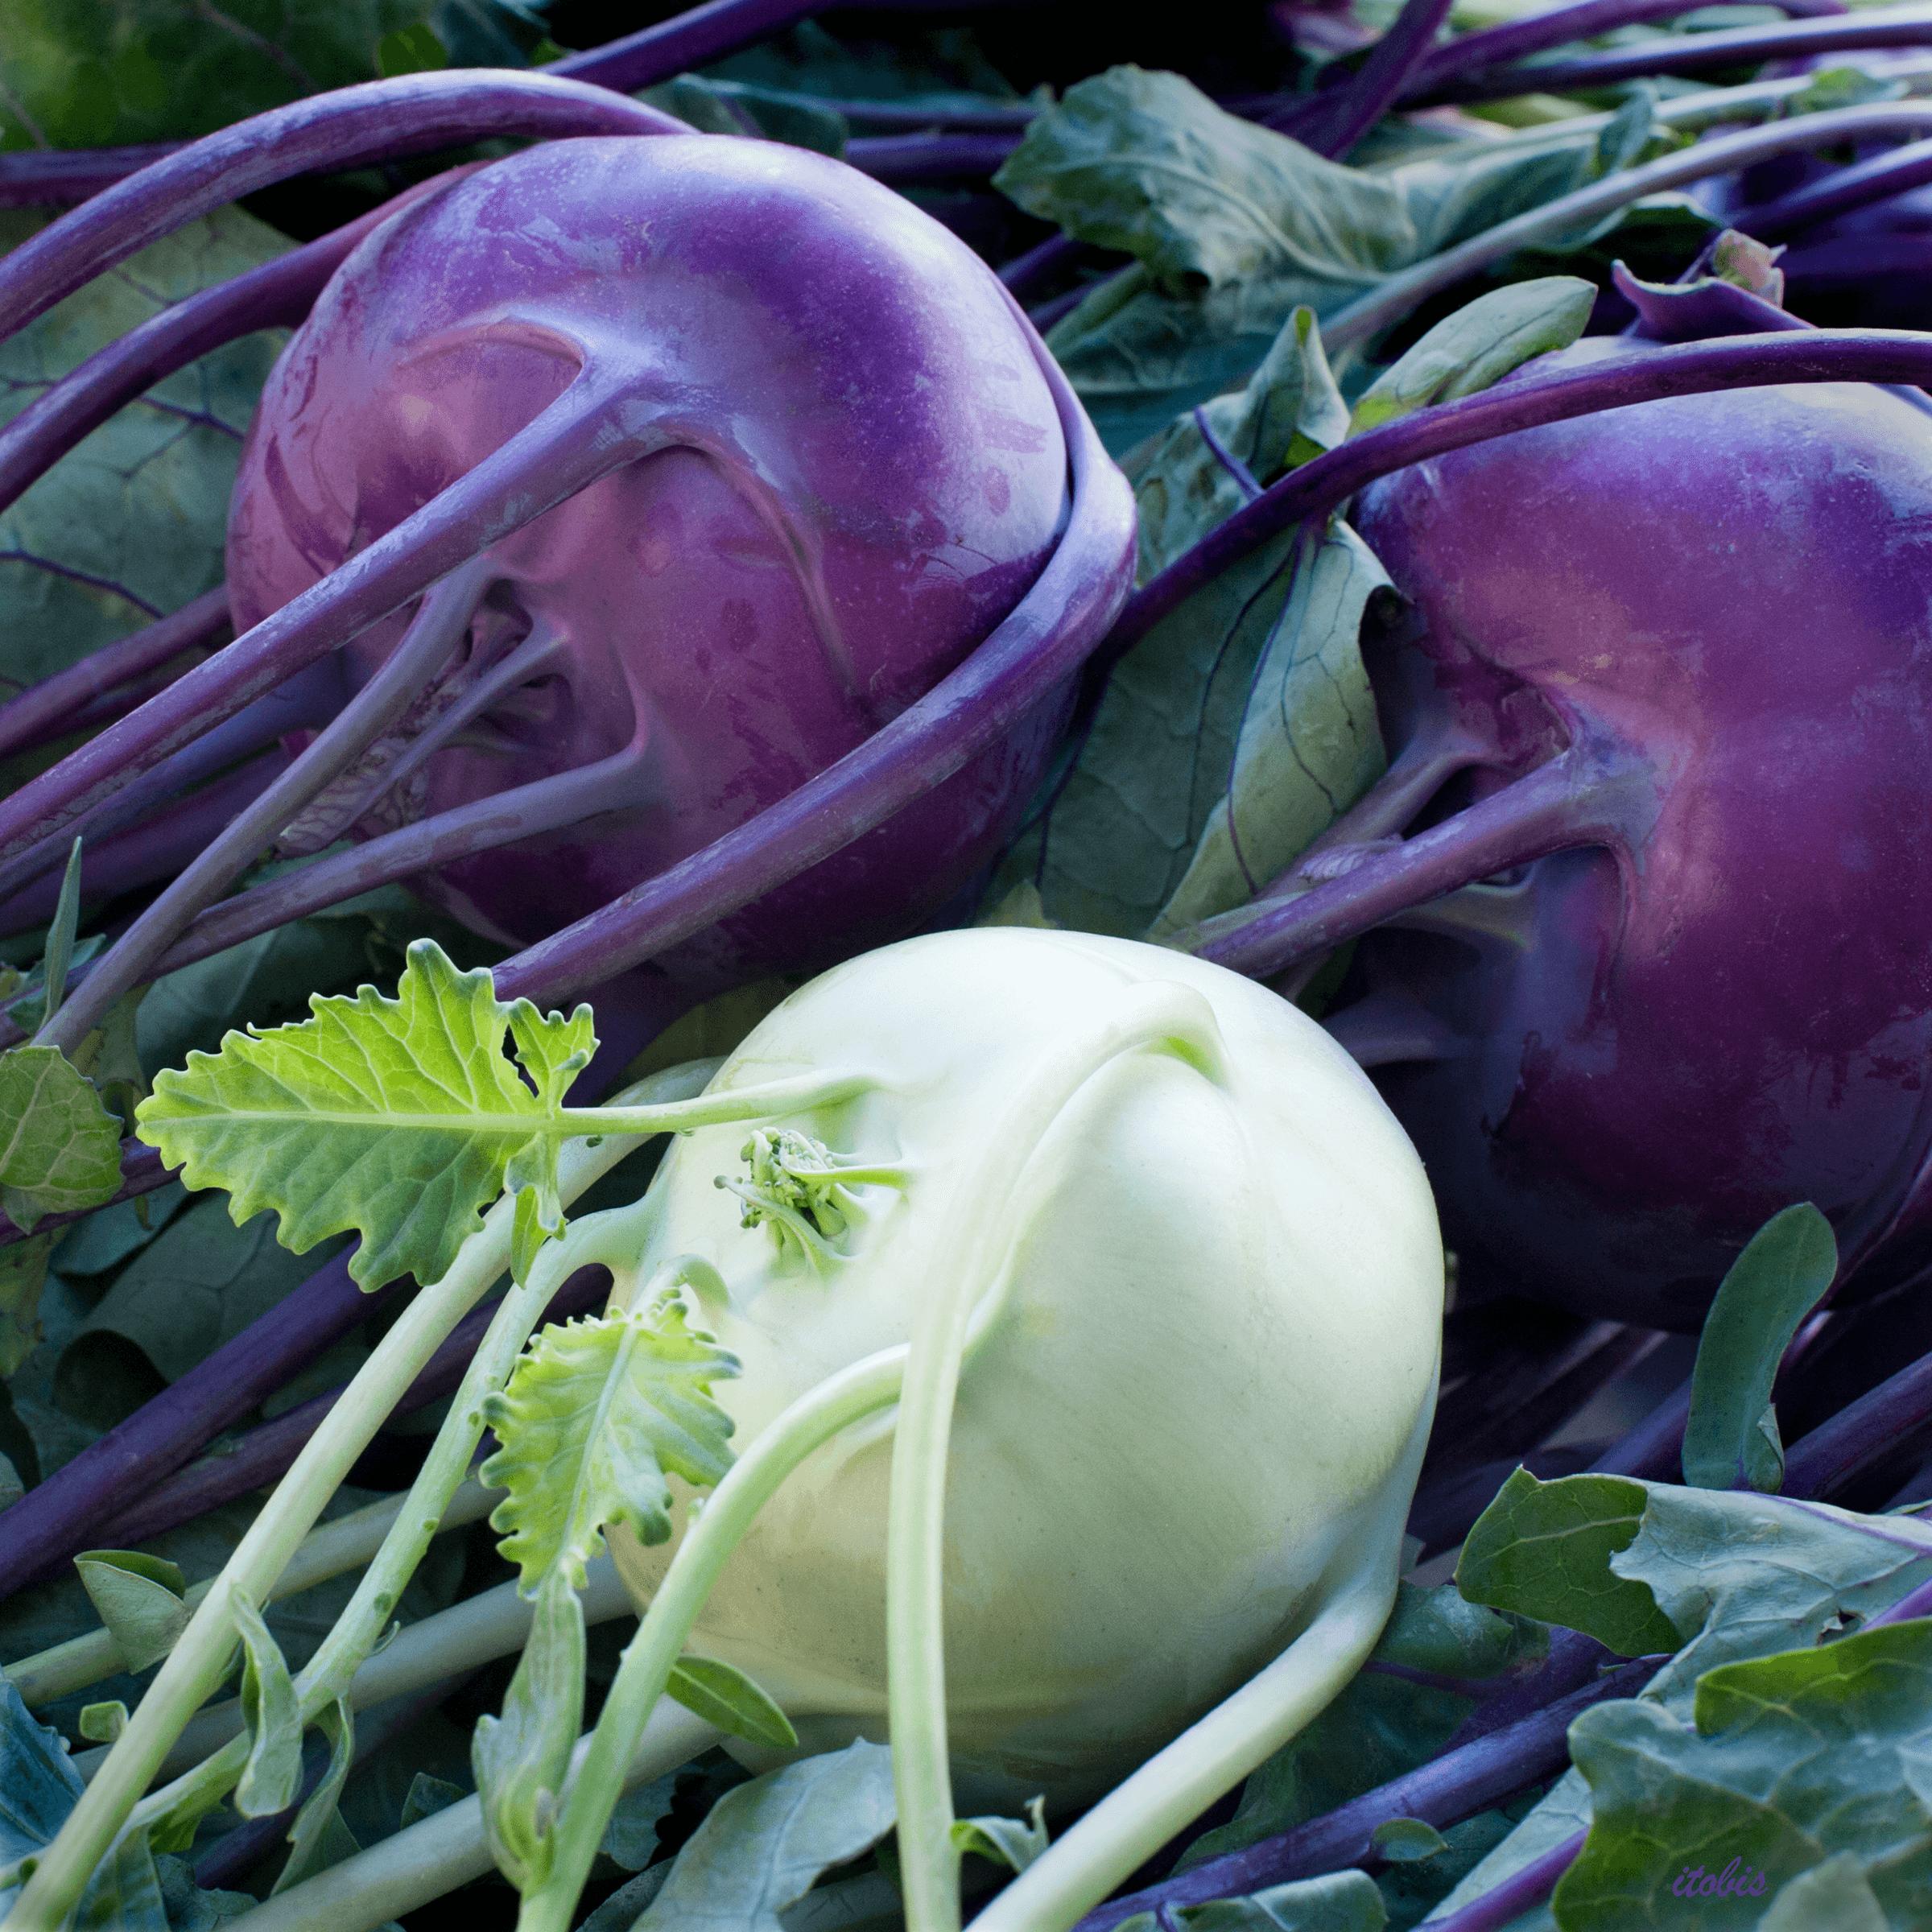 Kohlrabi at the Market - Allium Farm - Beechwood Farmers' Market, Ottawa, Ontario - photo by Irene Tobis